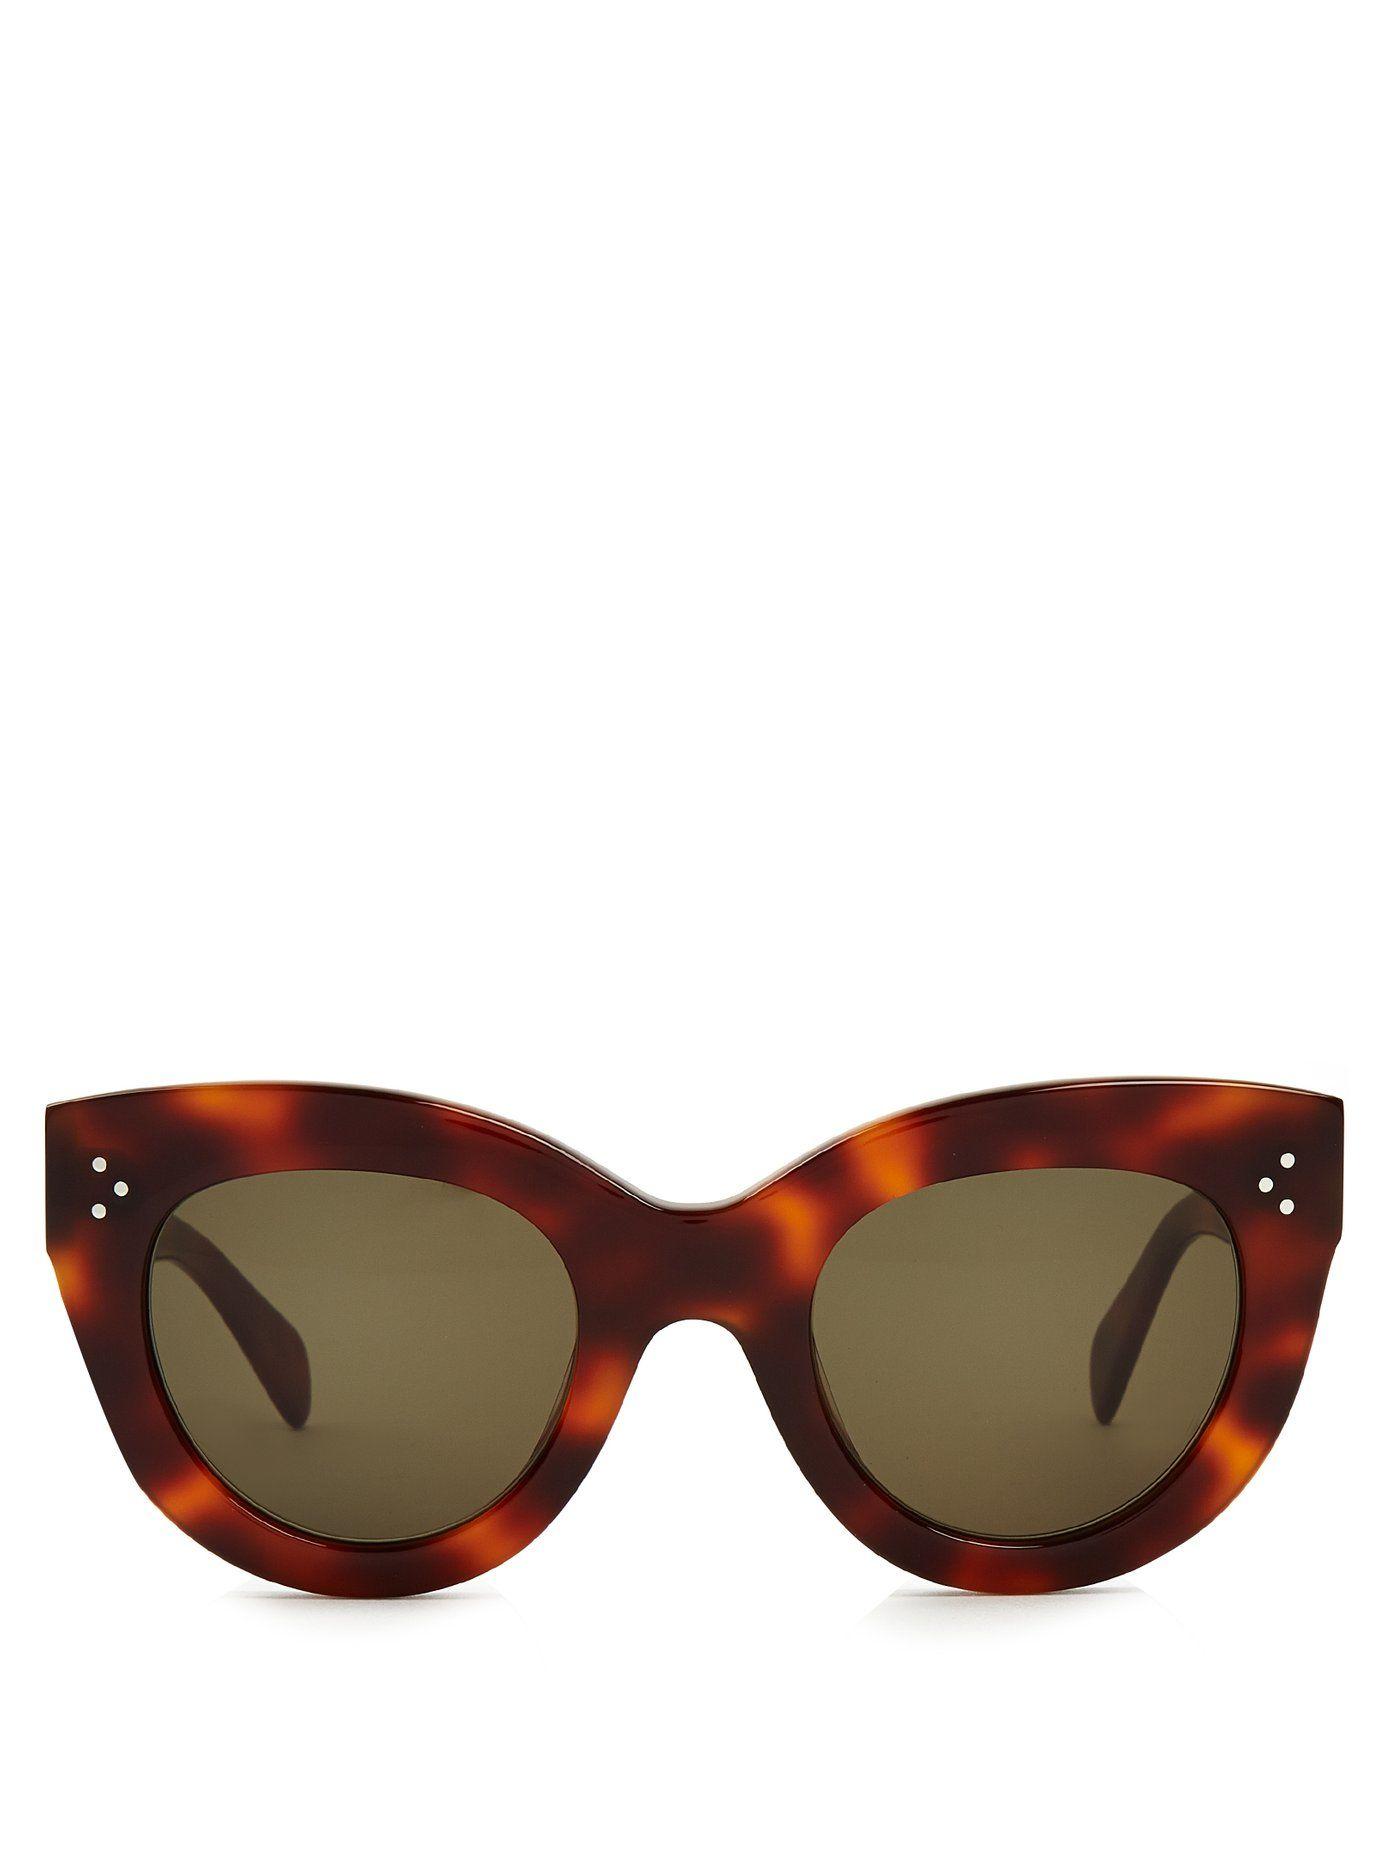 beabb51c079d Click here to buy Céline Eyewear Caty cat-eye acetate sunglasses at  MATCHESFASHION.COM